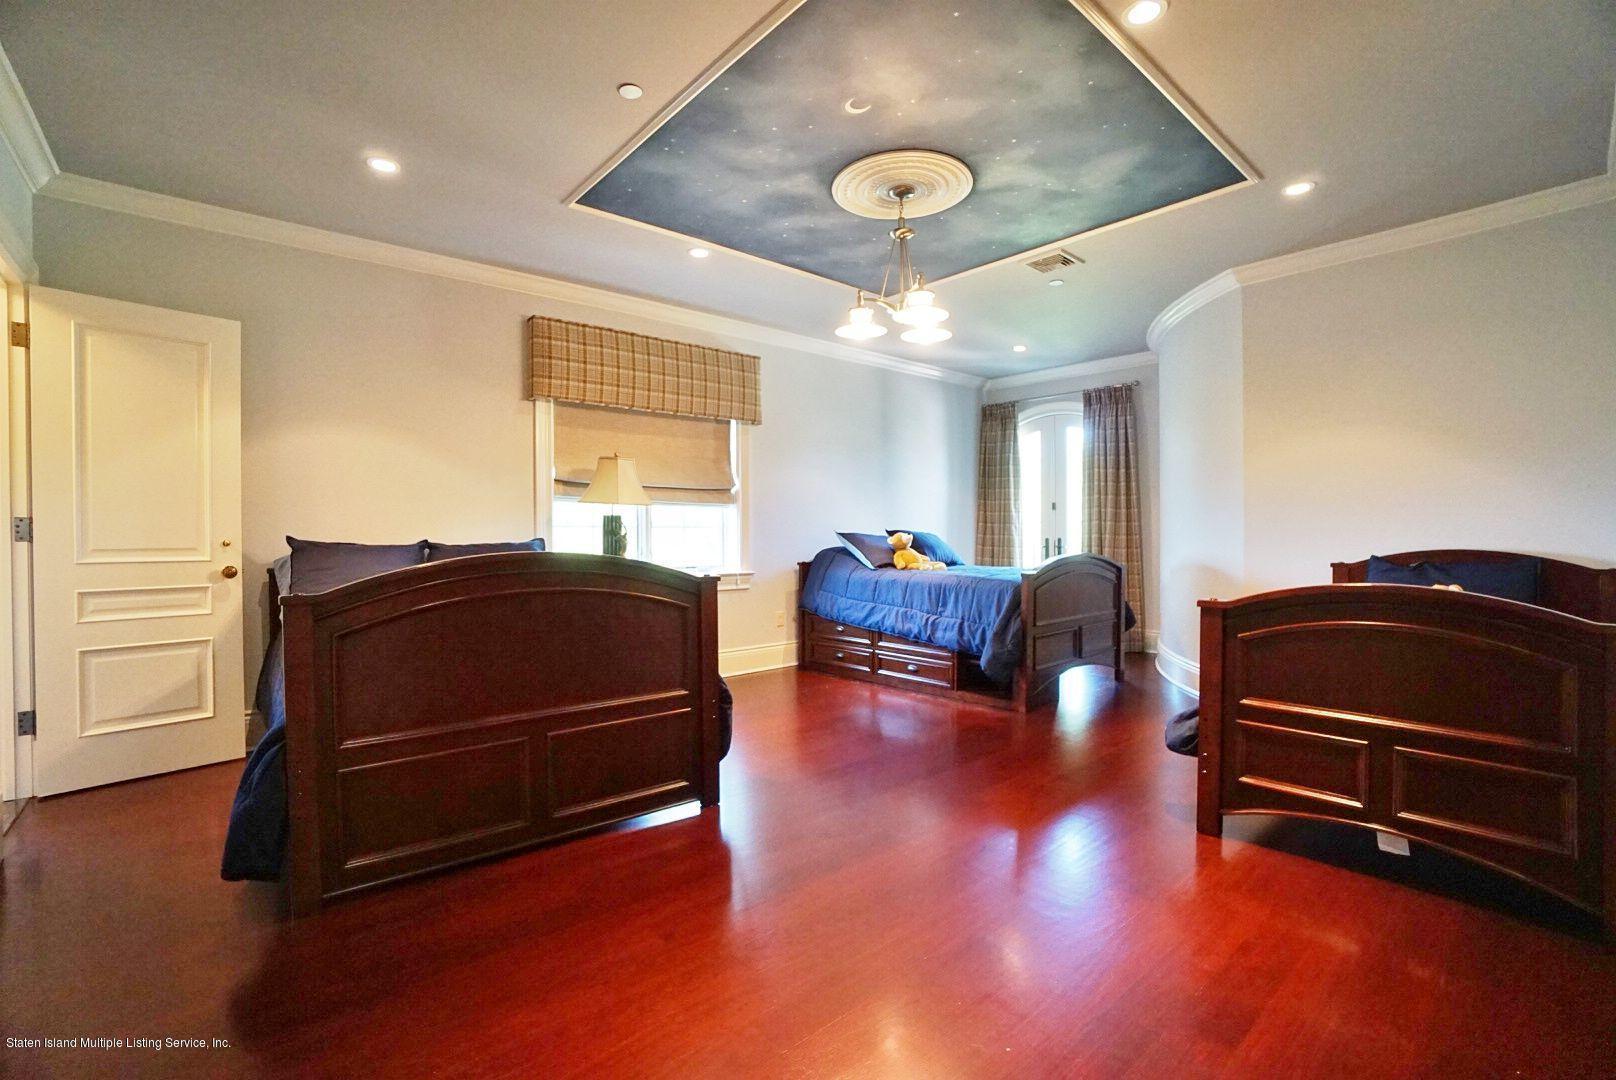 Single Family - Detached 40 Wakefield Road  Staten Island, NY 10312, MLS-1139236-51